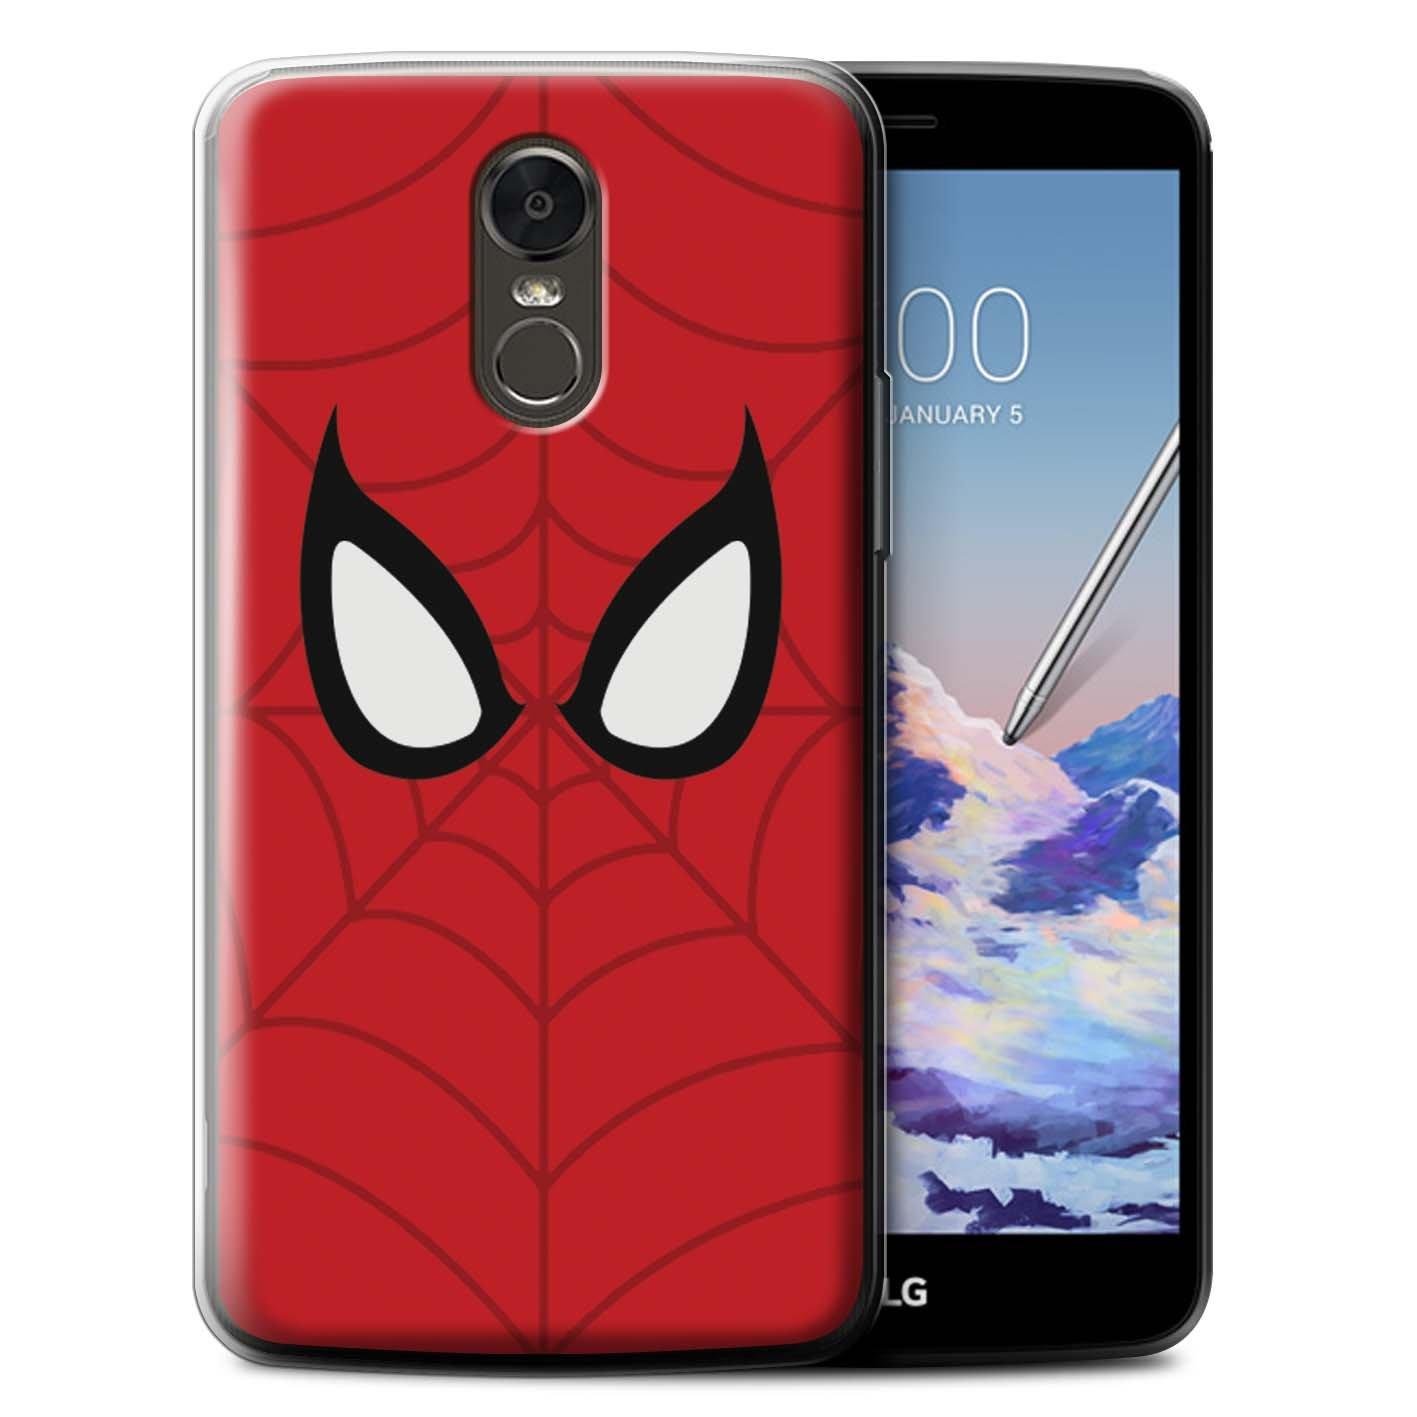 Phone Case for LG Stylus 3/Stylo 3/K10 Pro Super Hero Comic Art Spider-Man Mask Inspired Design Transparent Clear Ultra Soft Flexi Silicone Gel/TPU Bumper Cover